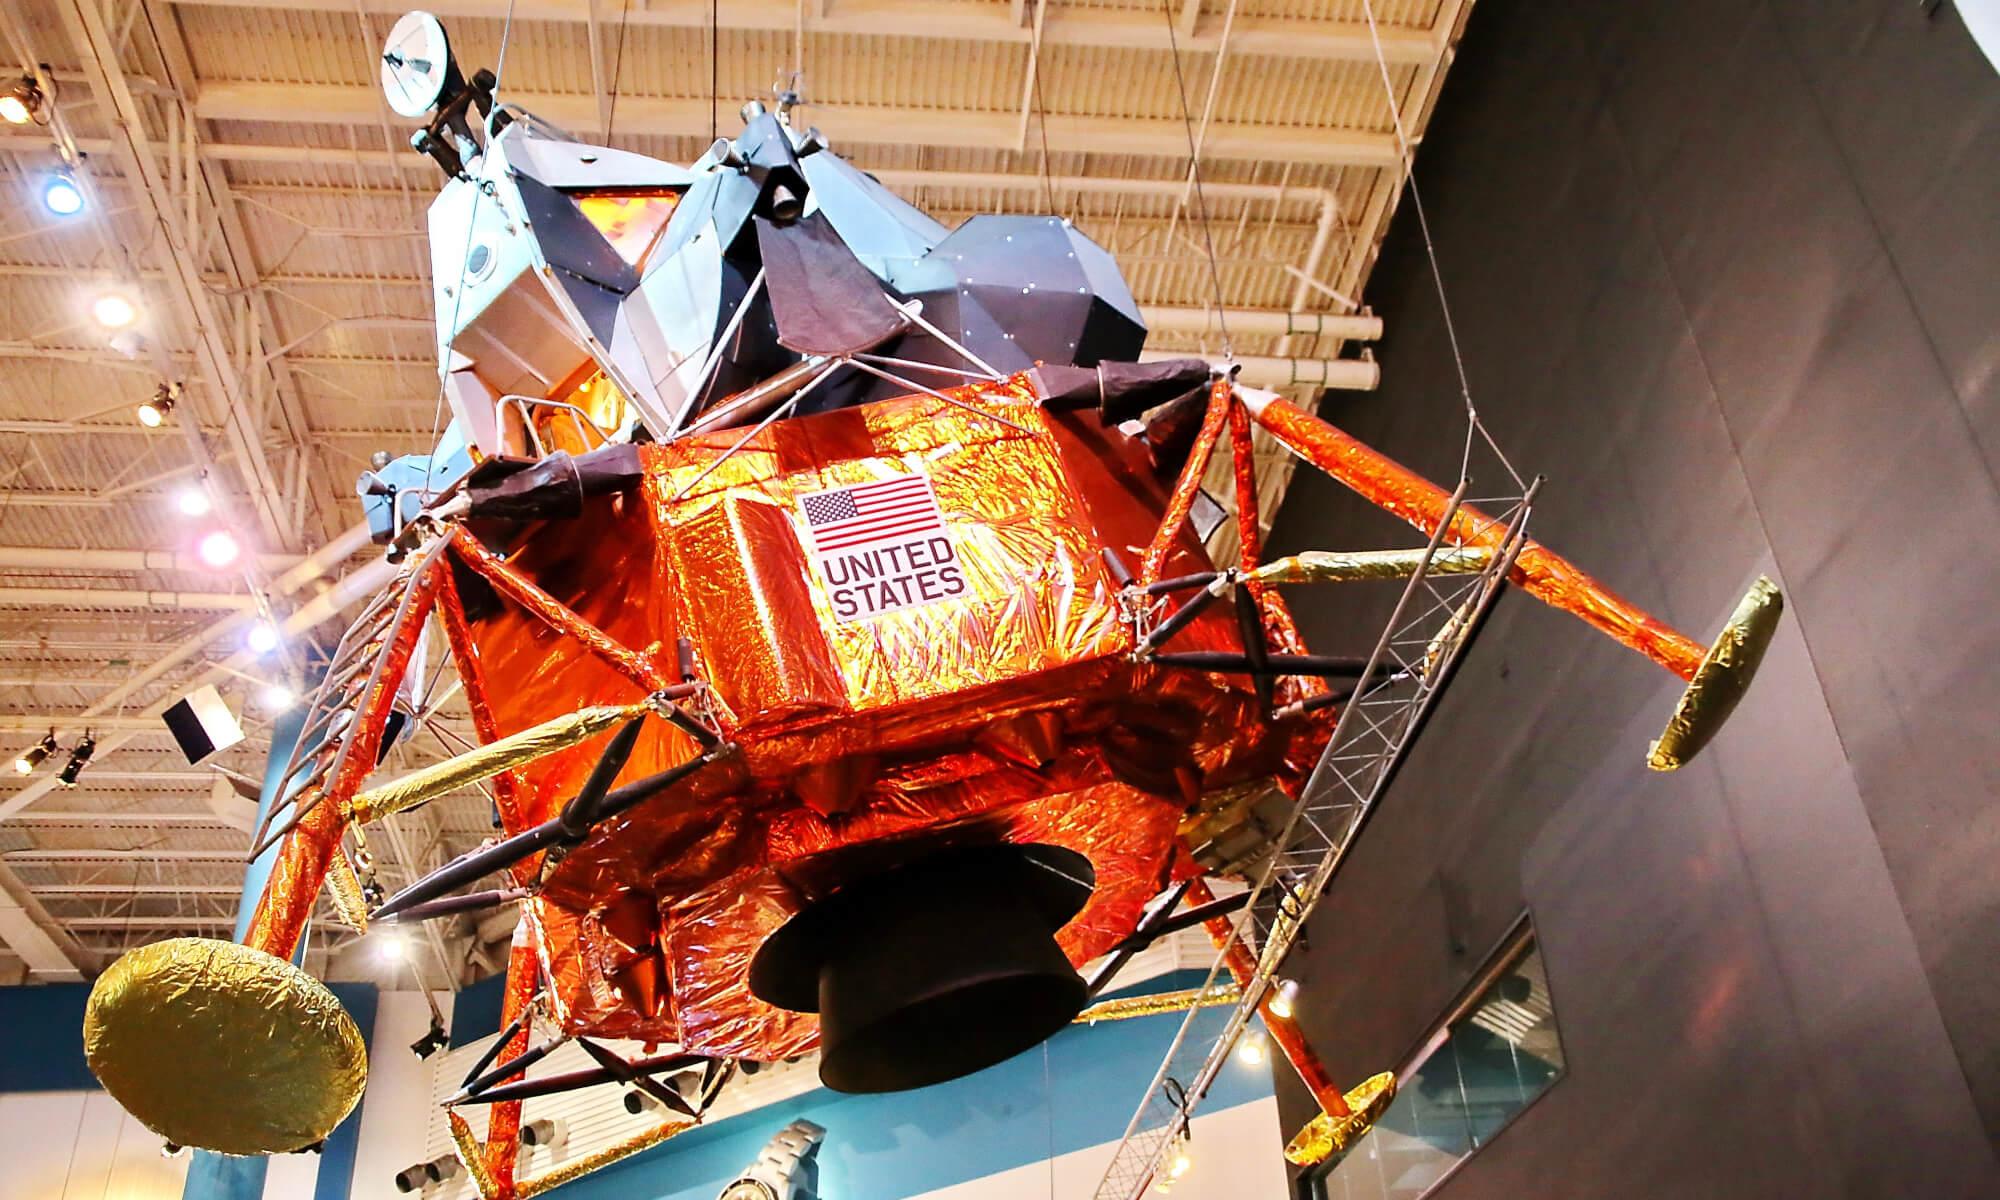 Space center in Houston, Texas